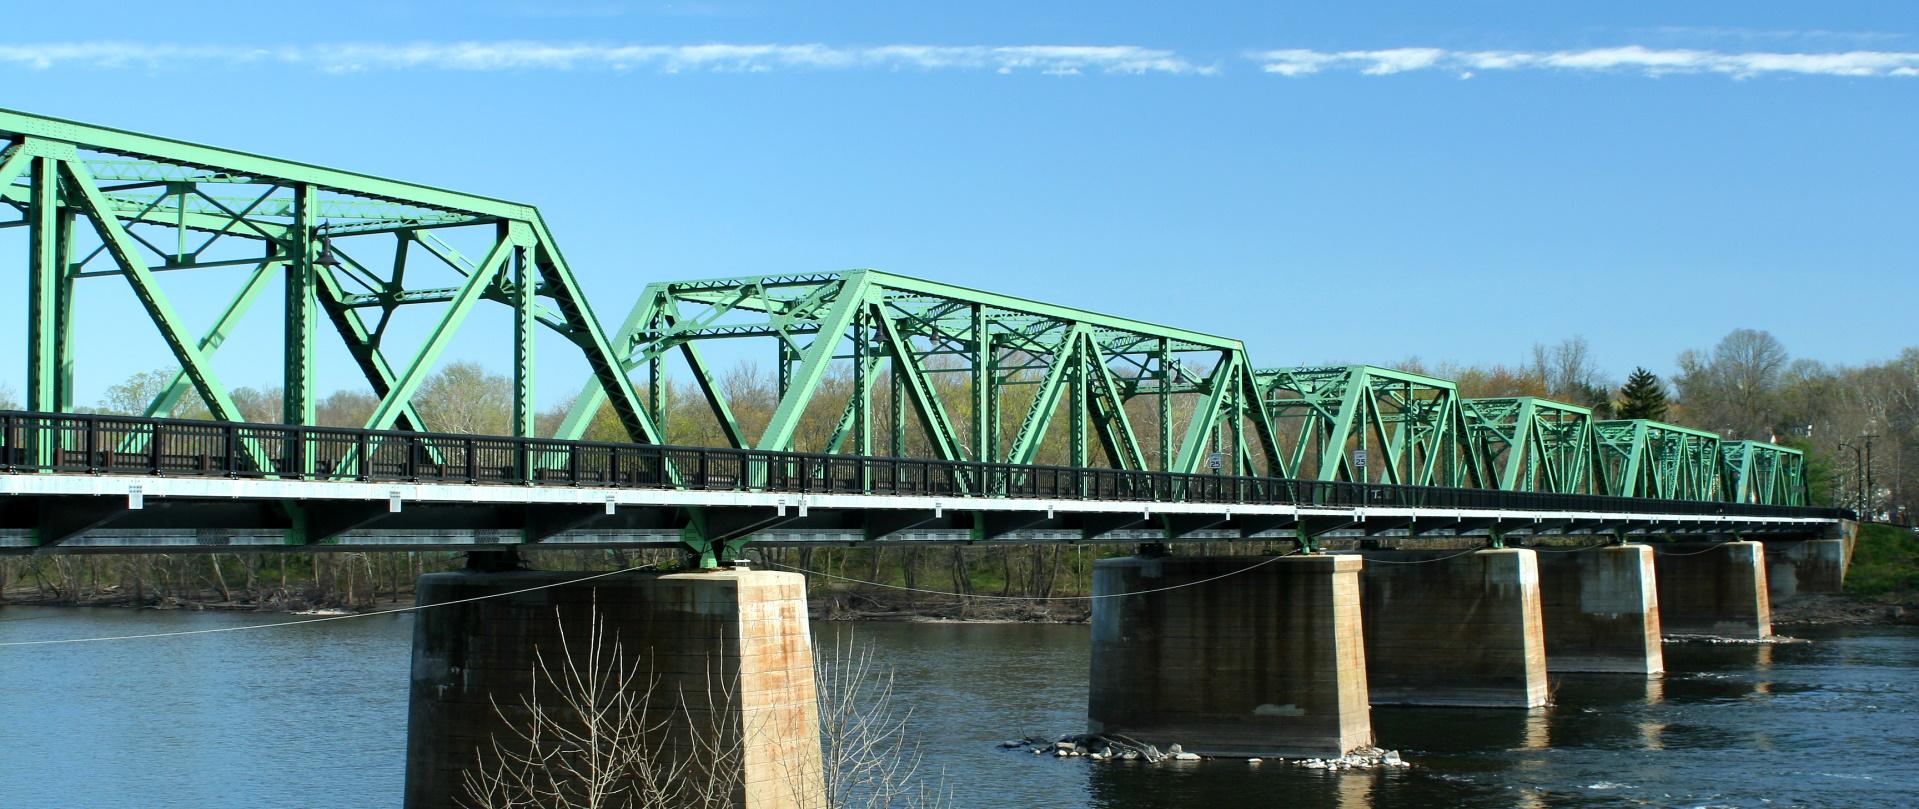 metal bridge over the delaware river PD2FVCM